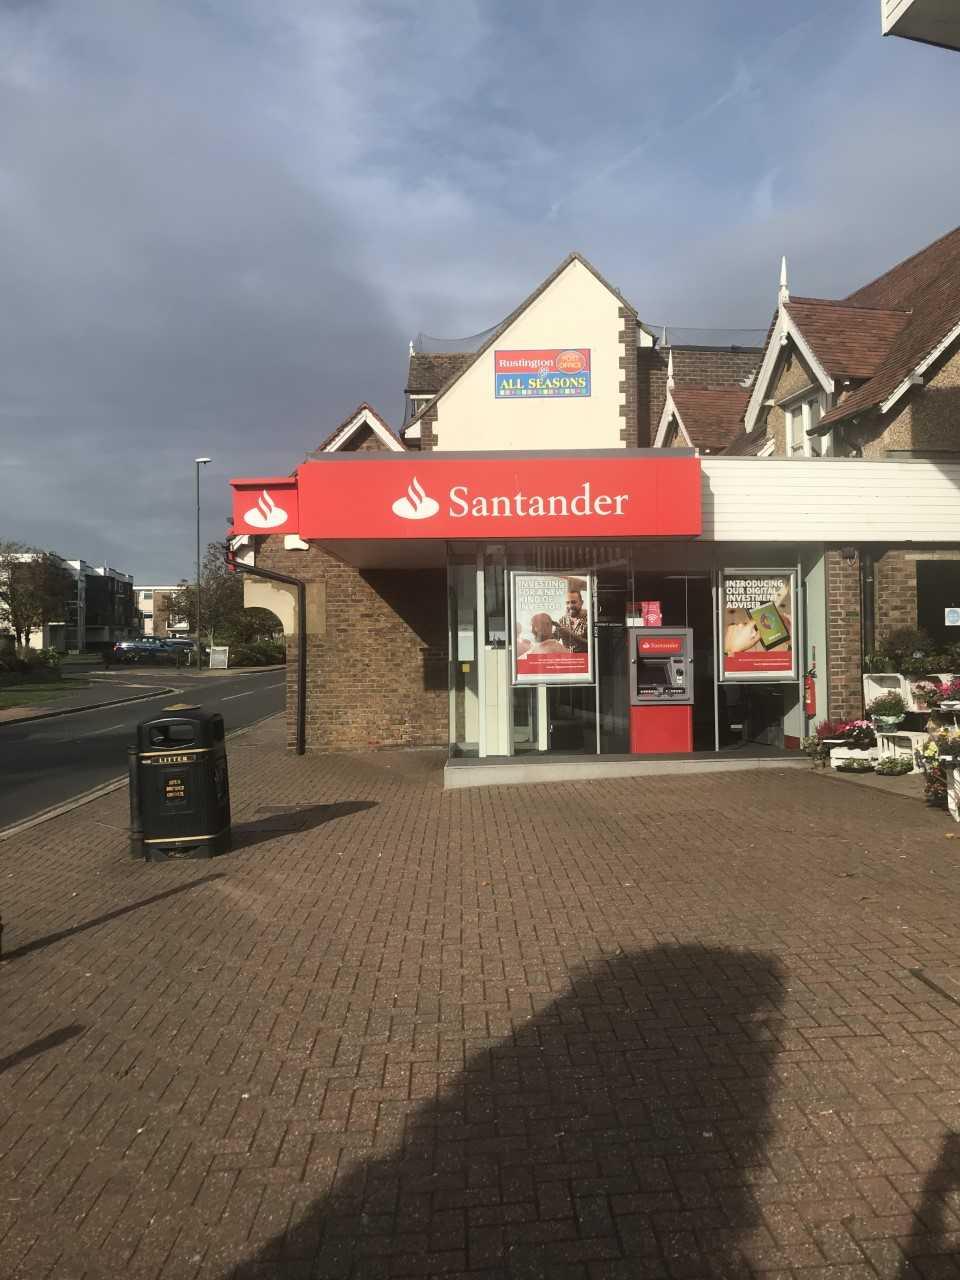 Santander in Rustington